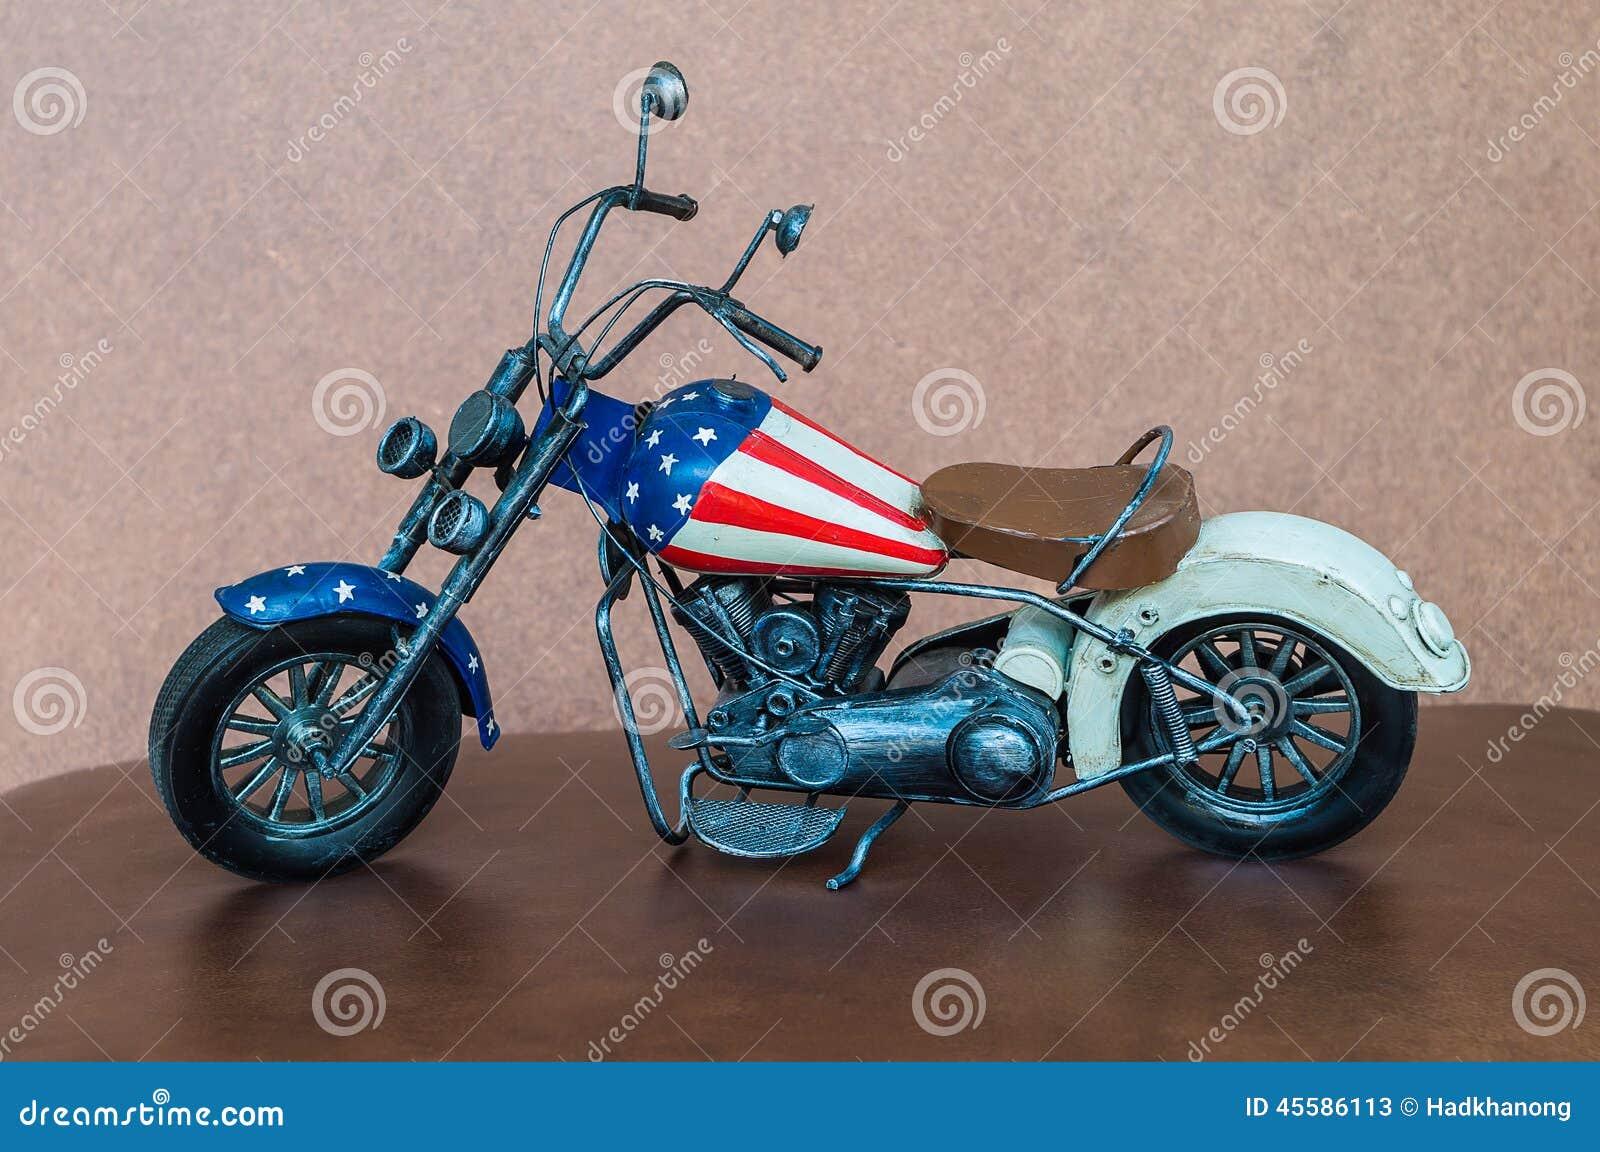 petite moto de jouet photo stock image 45586113. Black Bedroom Furniture Sets. Home Design Ideas